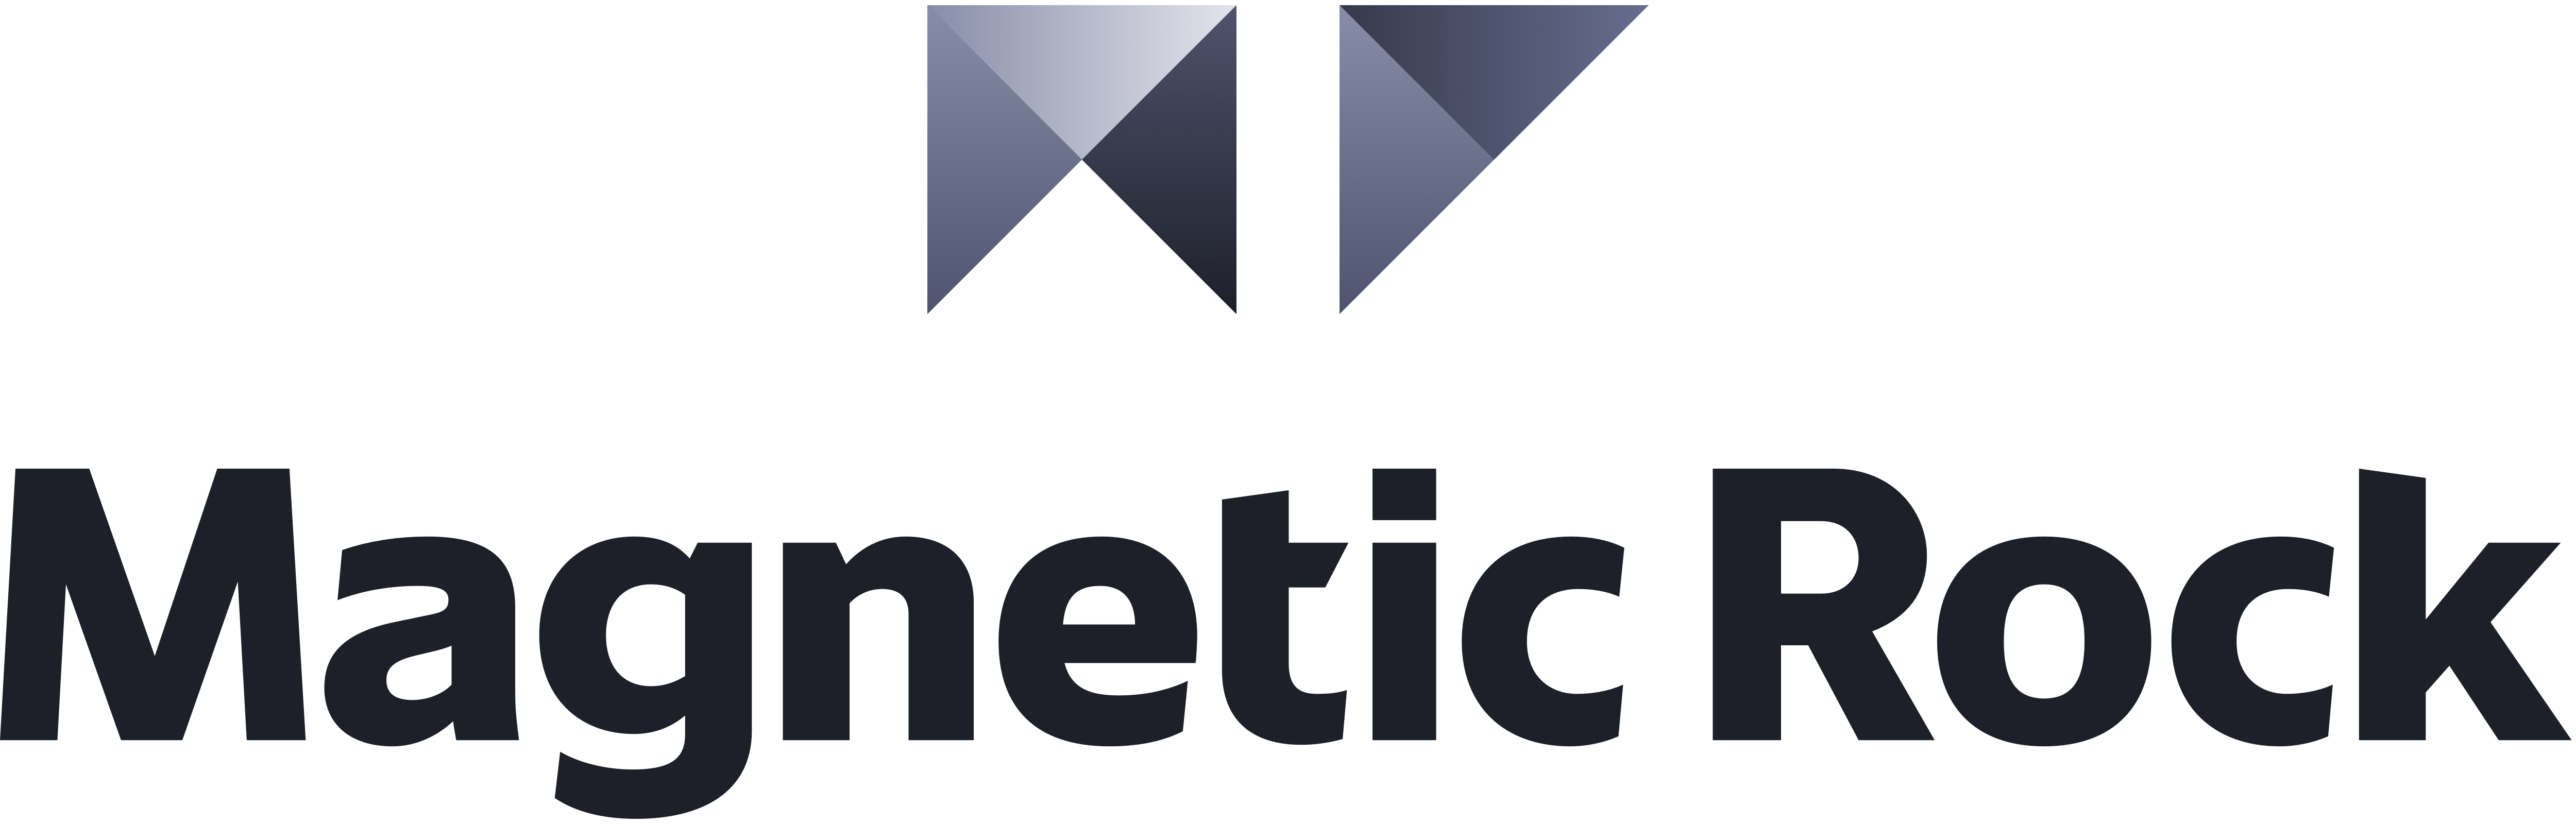 Magnetic Rock Company Logo